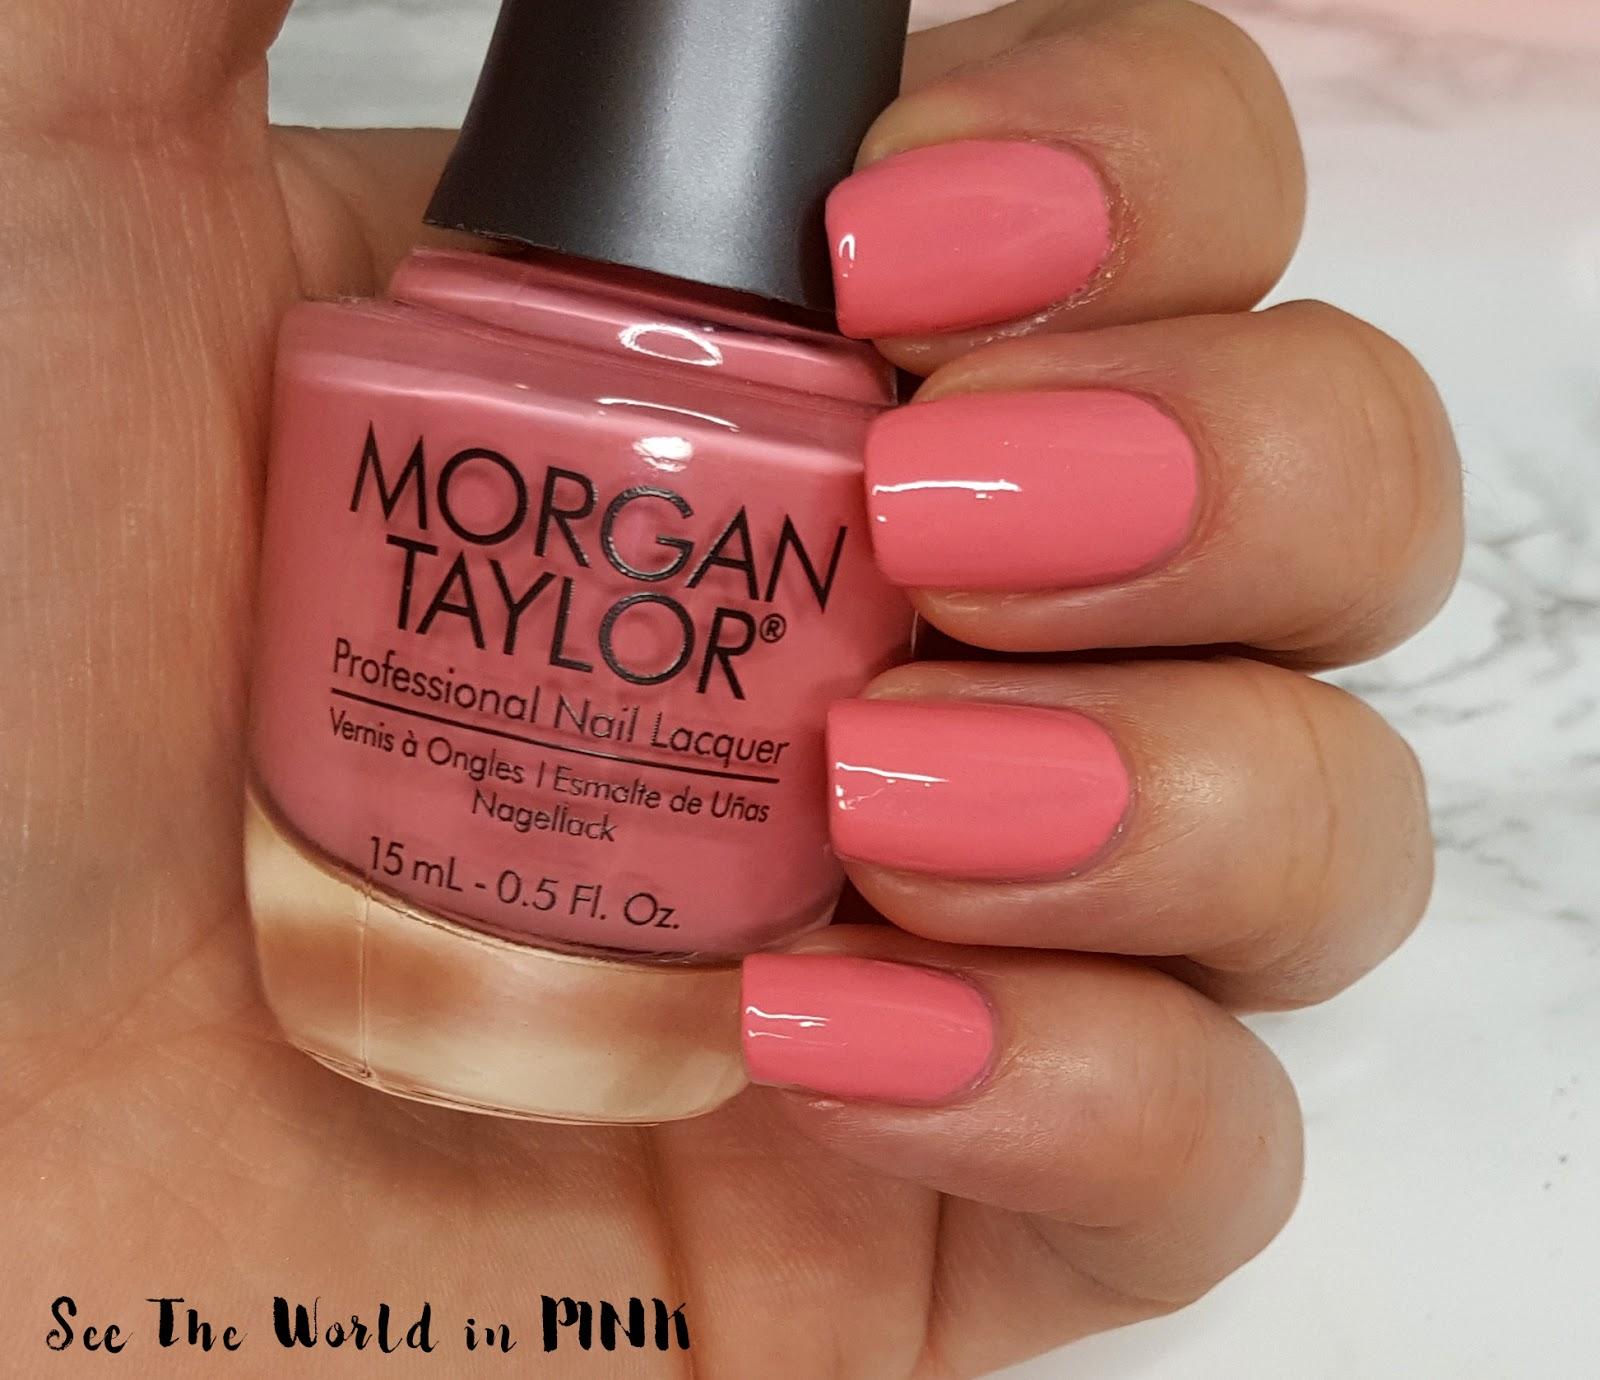 Morgan Taylor Royal Temptations collection Beauty Marks The Spot